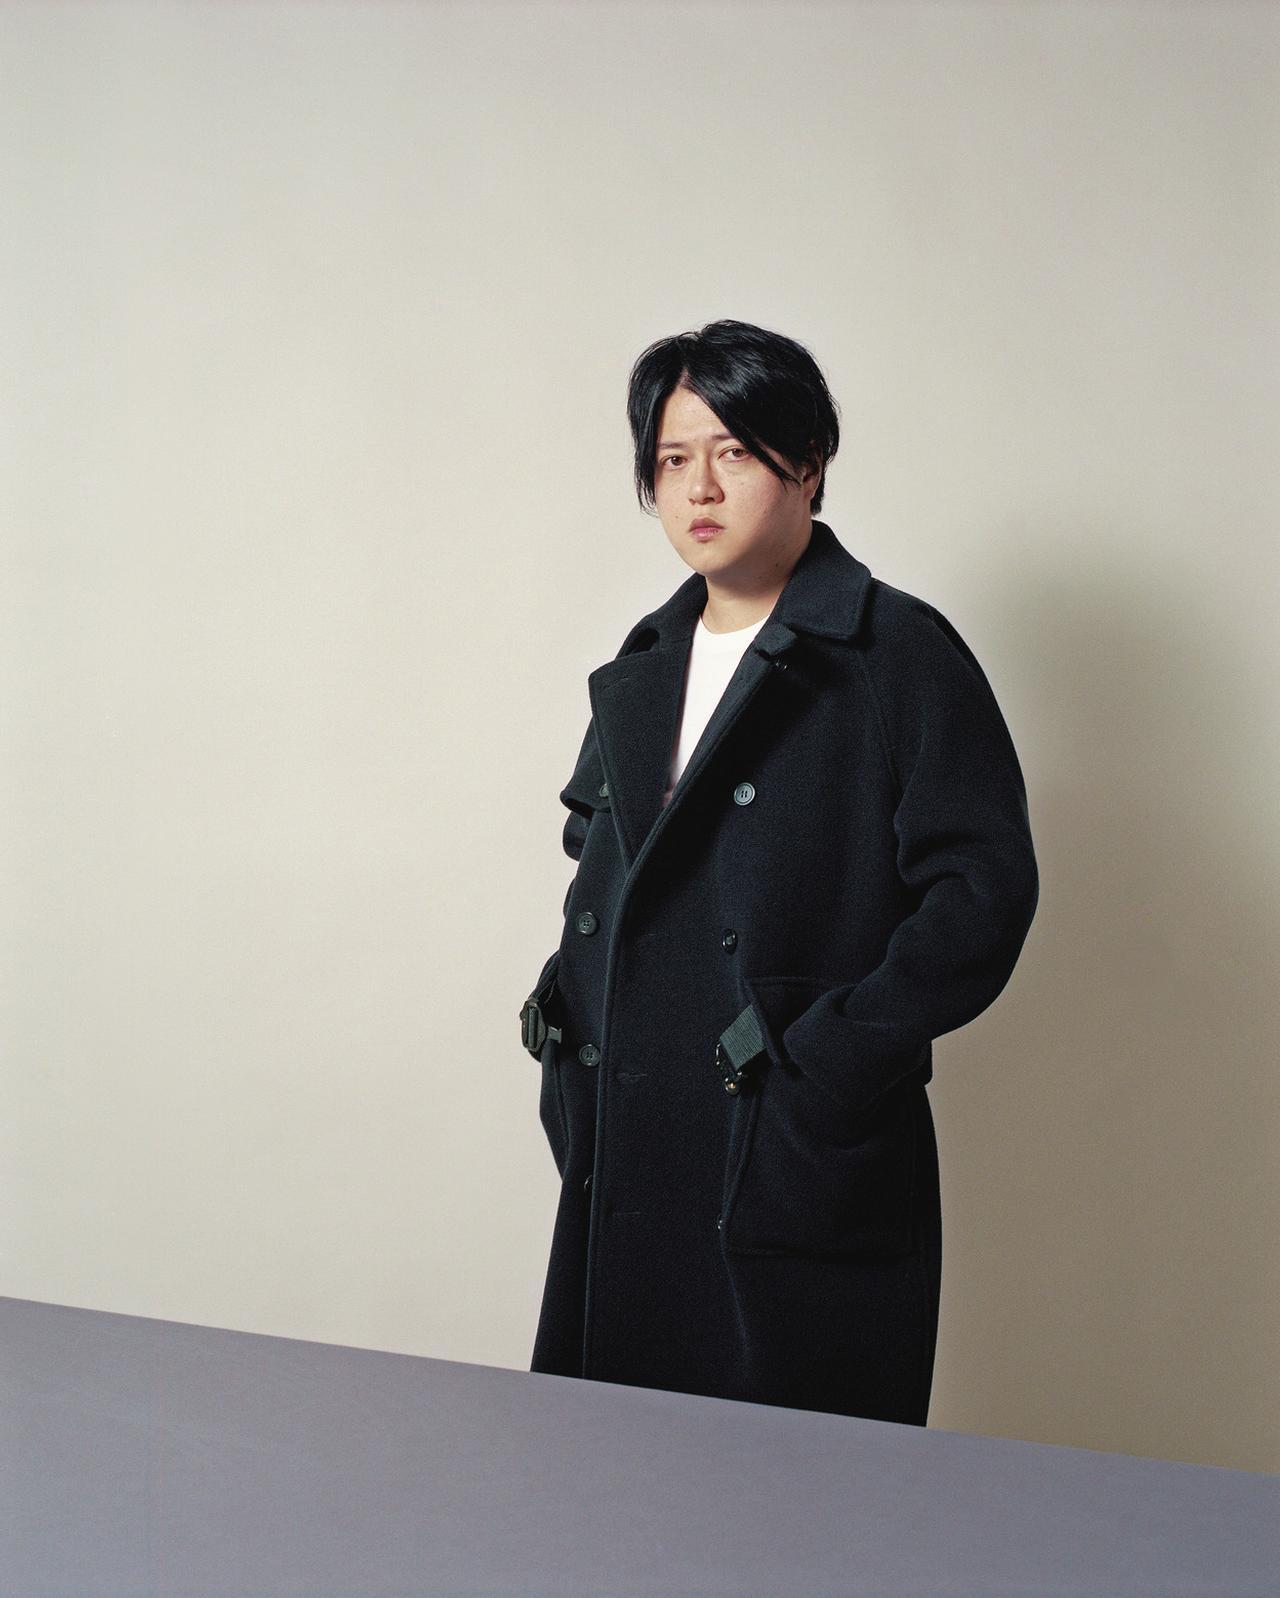 Images : 渋谷慶一郎(KEIICHIRO SHIBUYA)